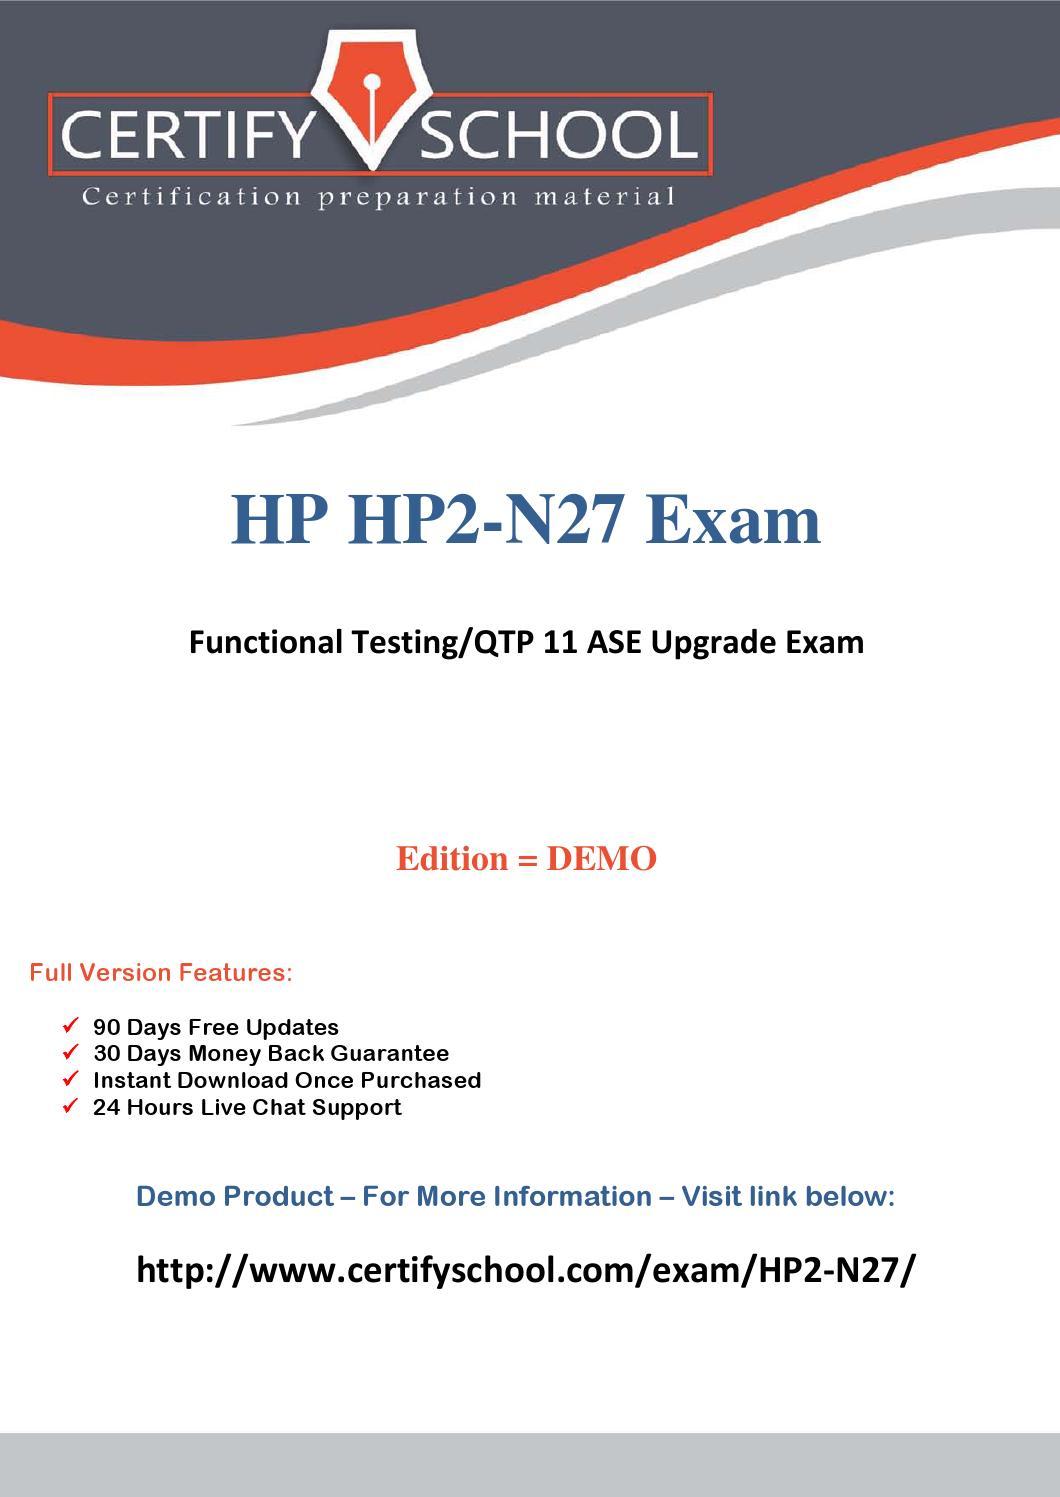 Hp2 N27 Certifyschool Exam Actual Questions Pdf By Certifyschool